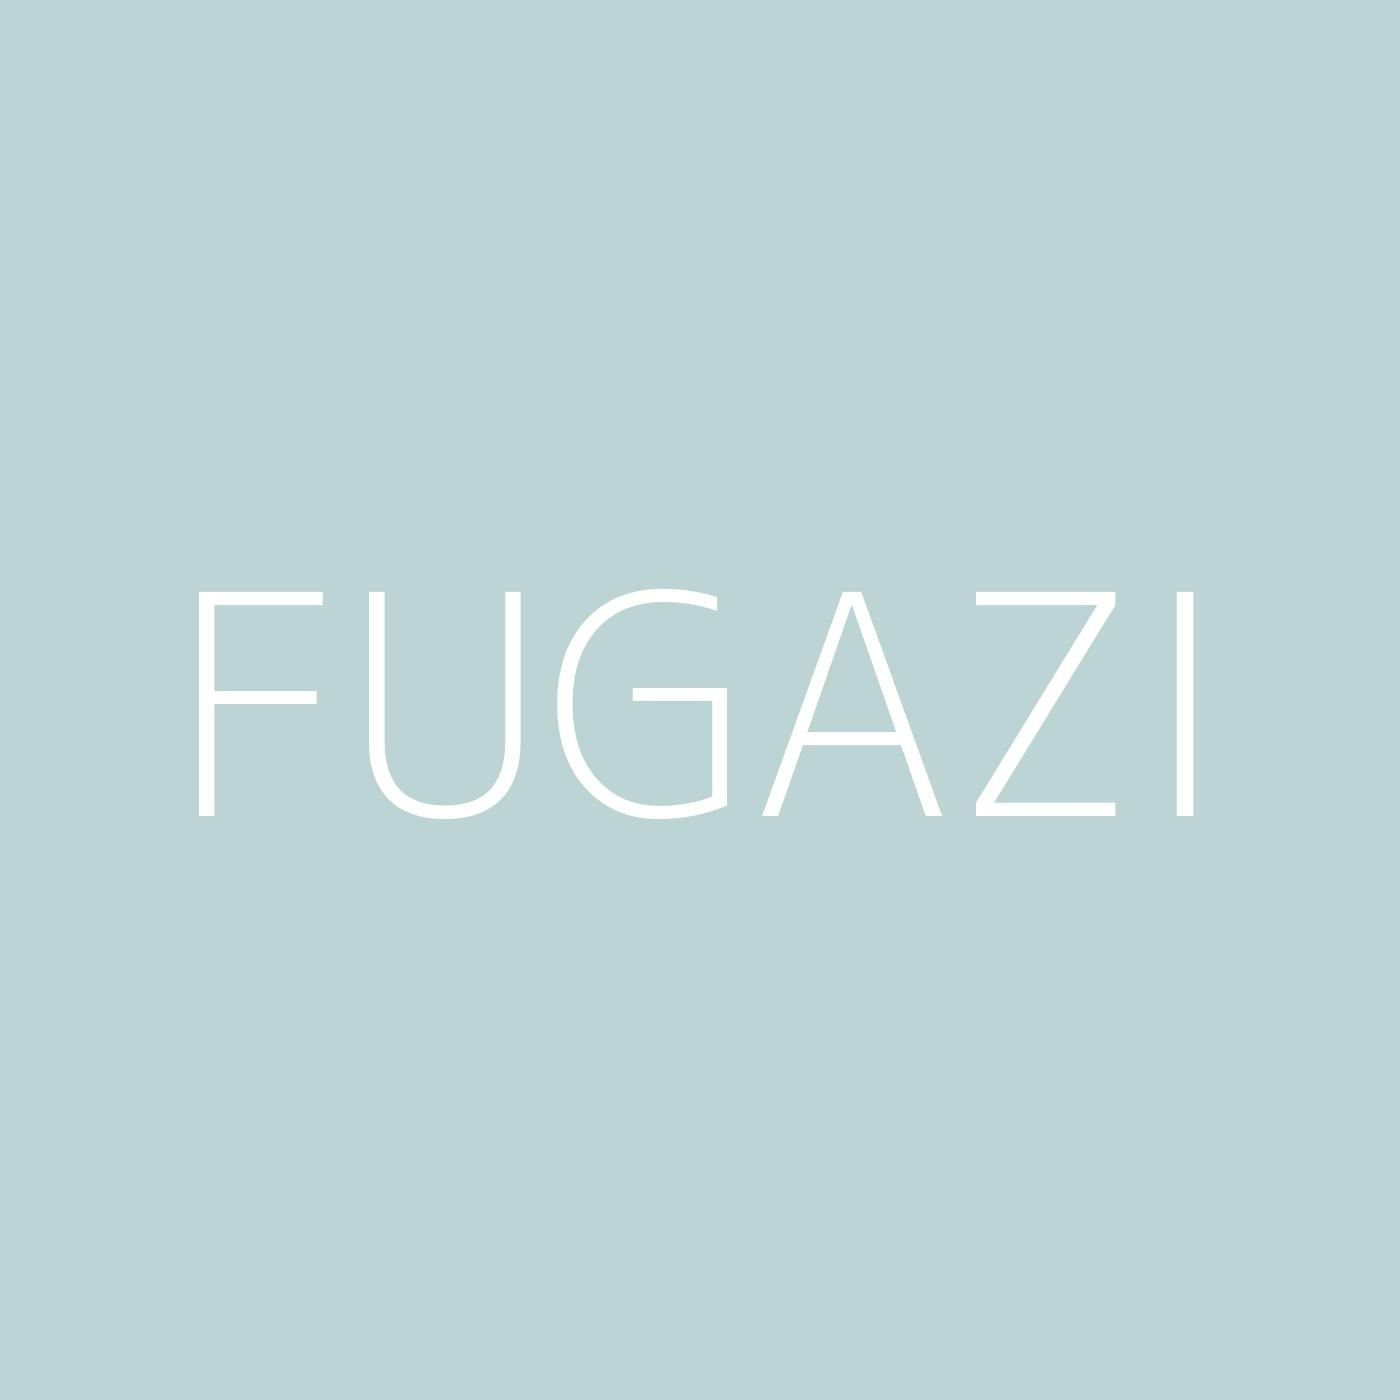 Fugazi Playlist Artwork